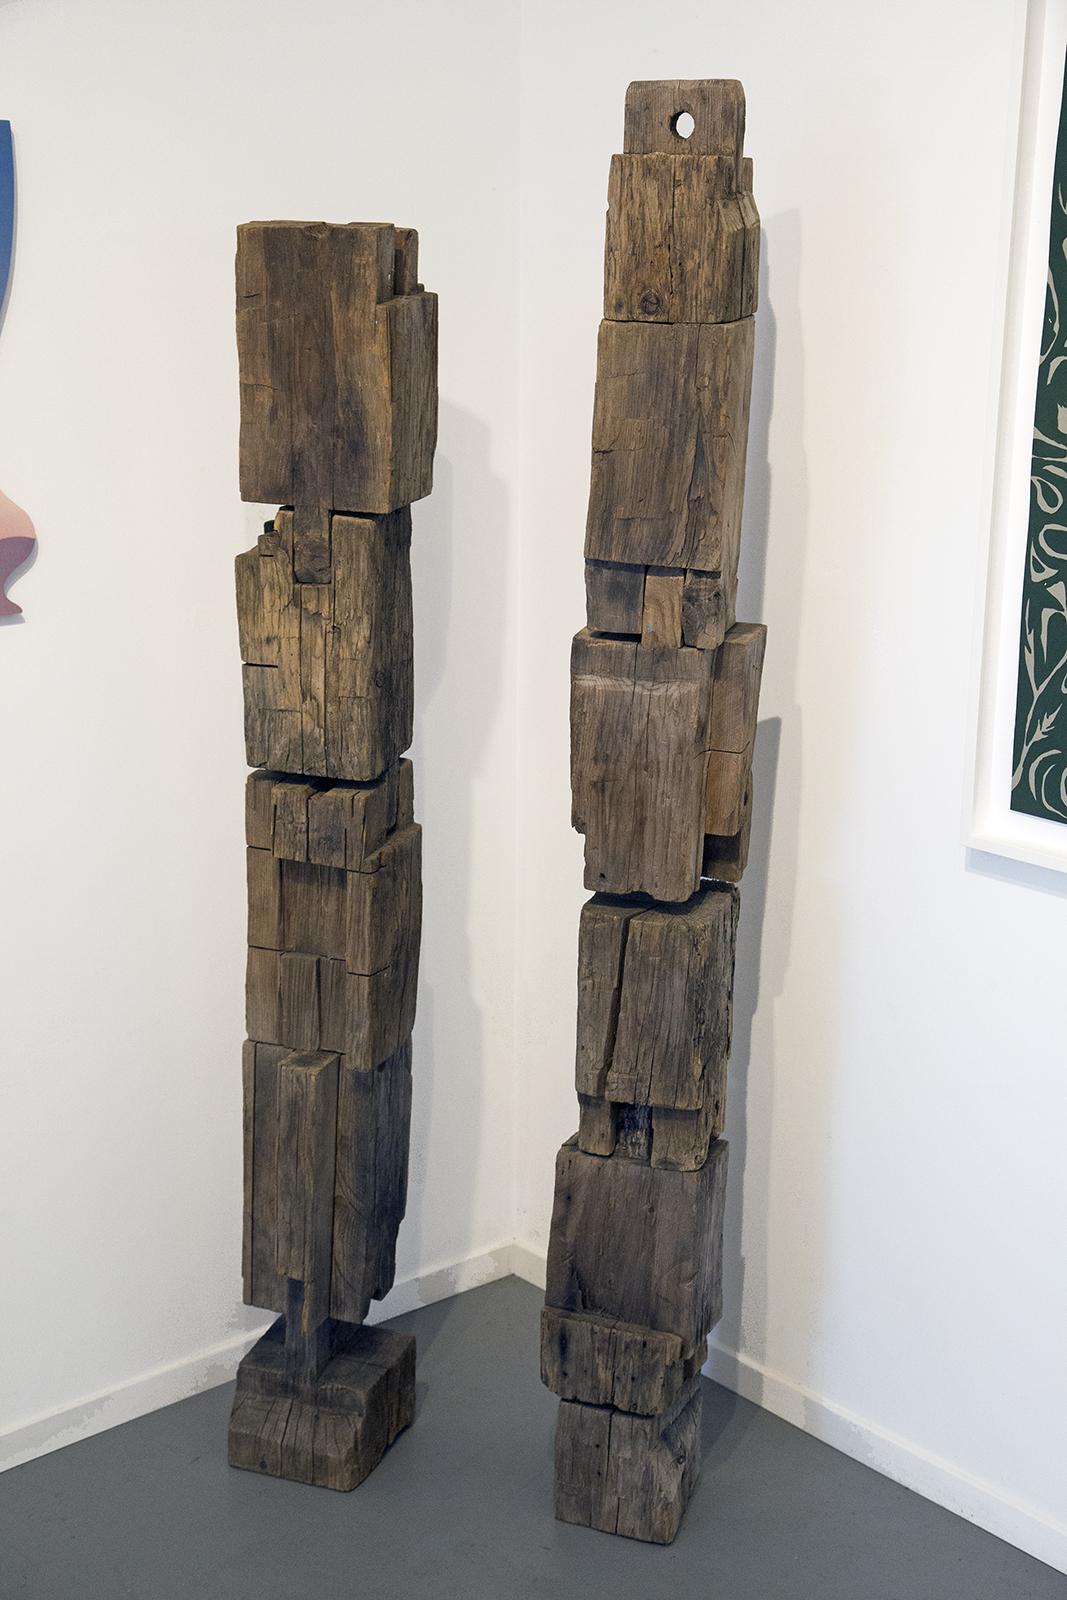 Joe Meade sculpture at Public Land Gallery in Sacramento